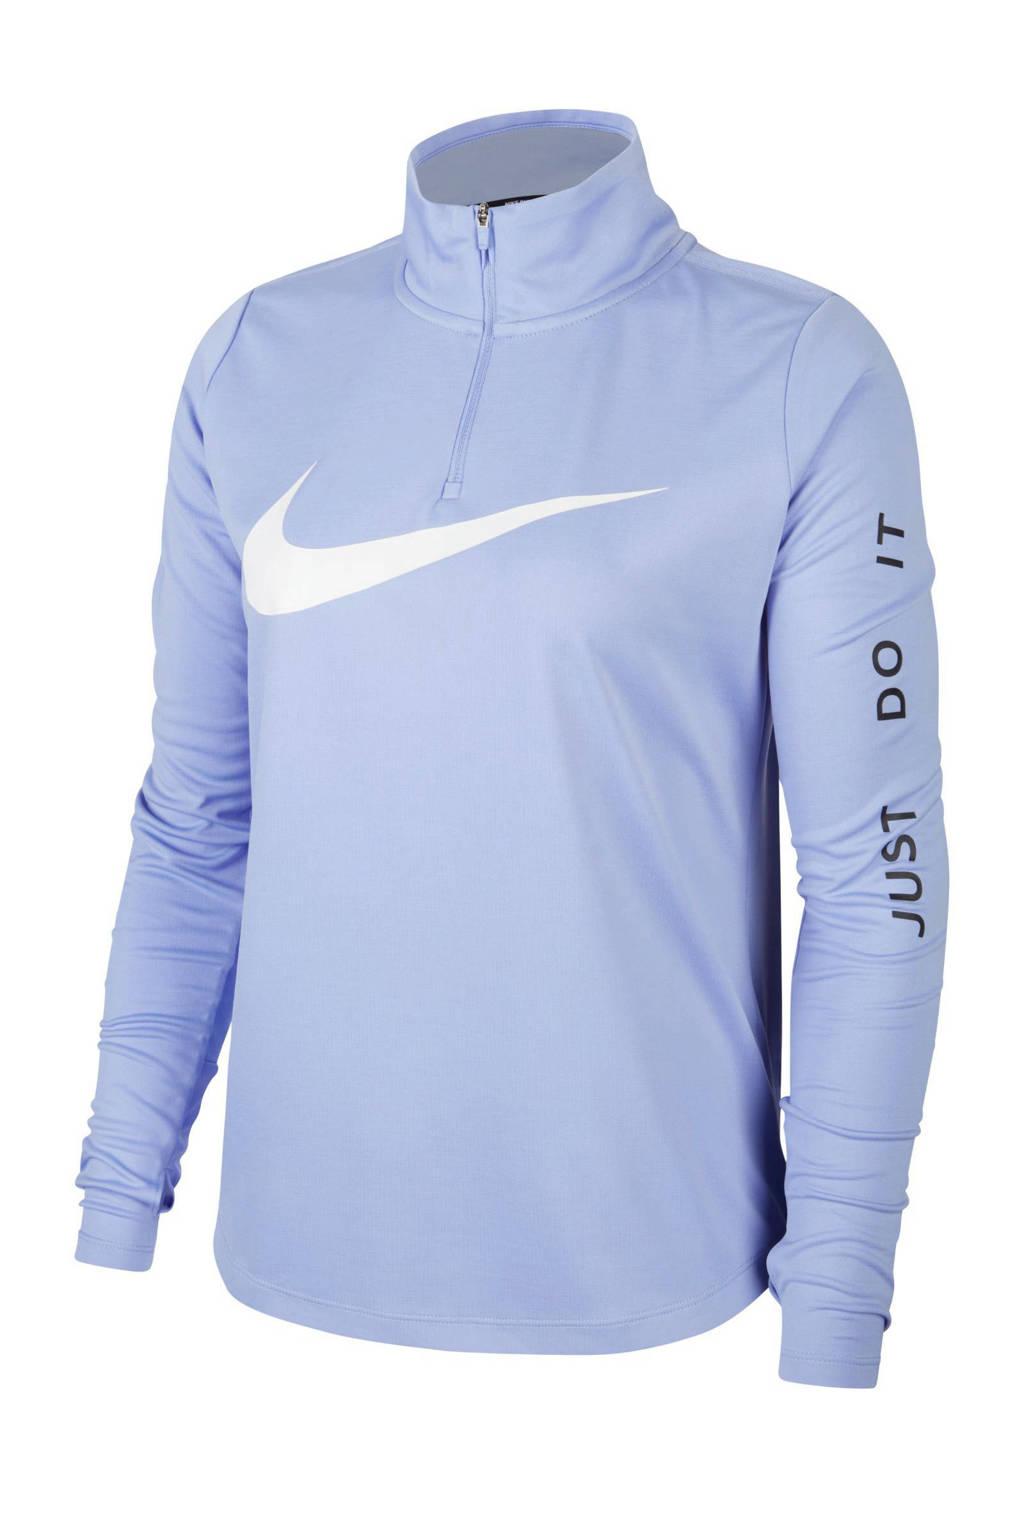 Nike hardloopshirt lila, Lila